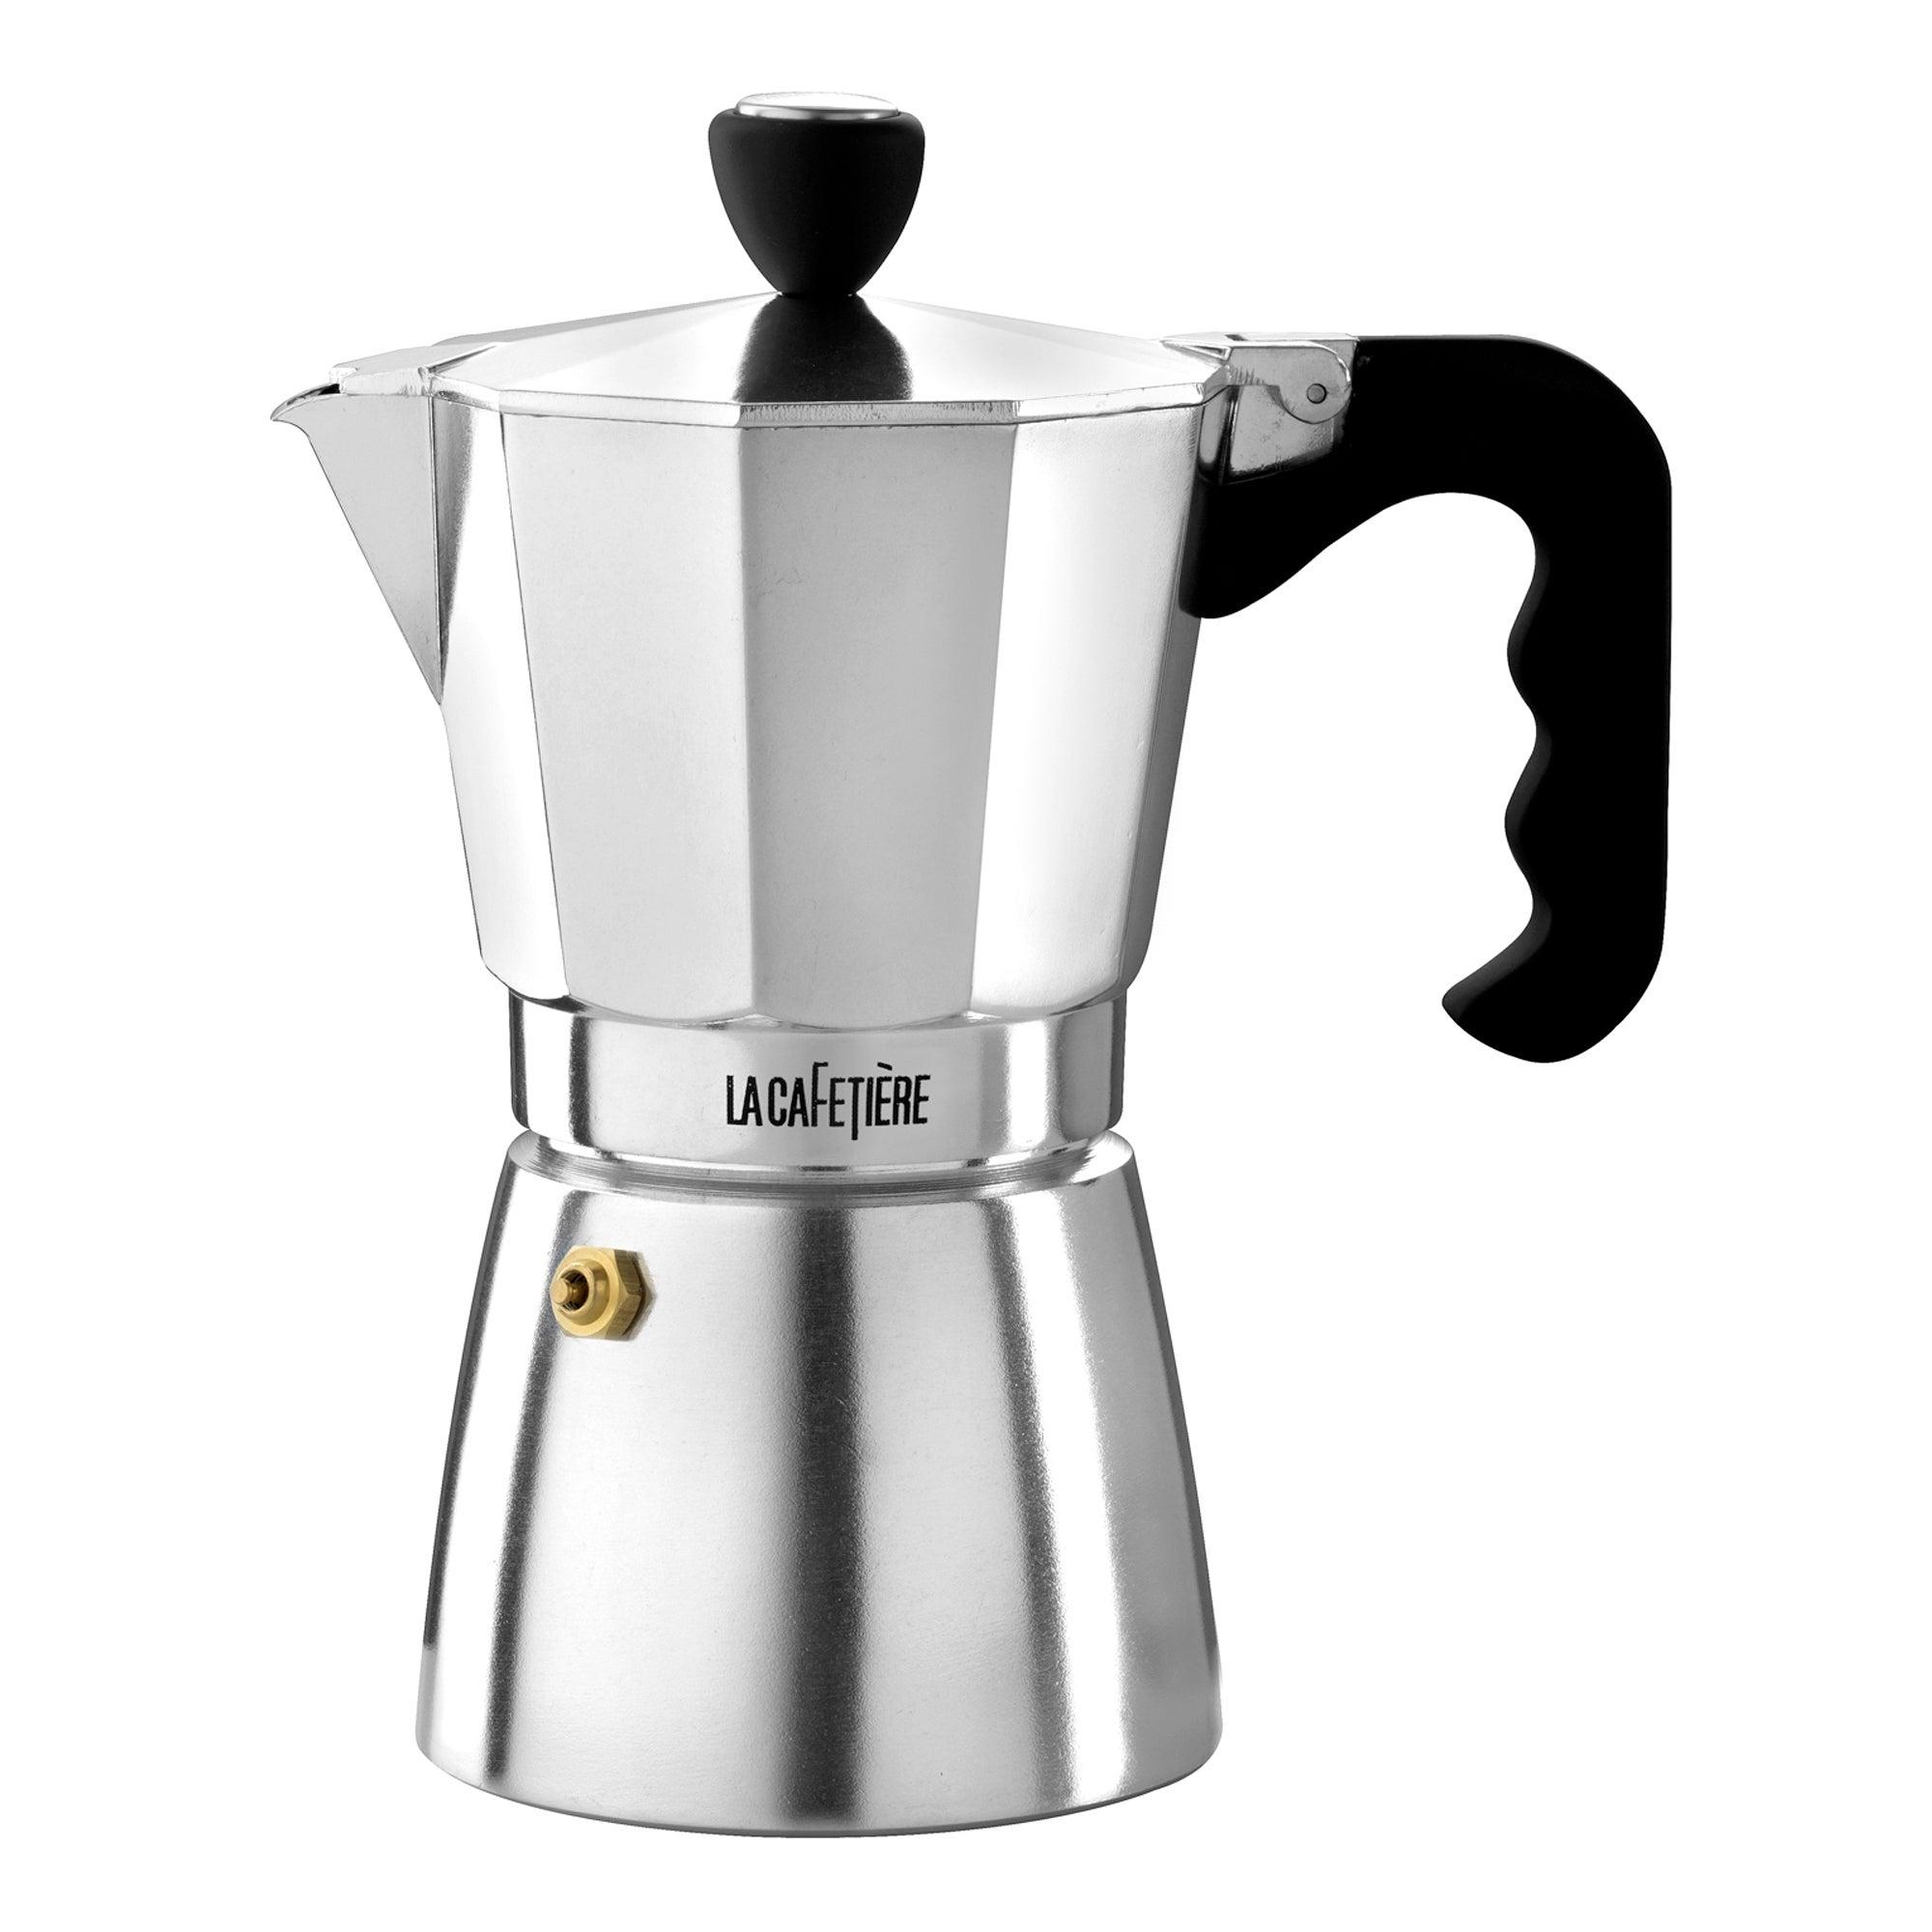 La Cafetiere Silver 6 Cup Stove Top Coffee Maker Silver